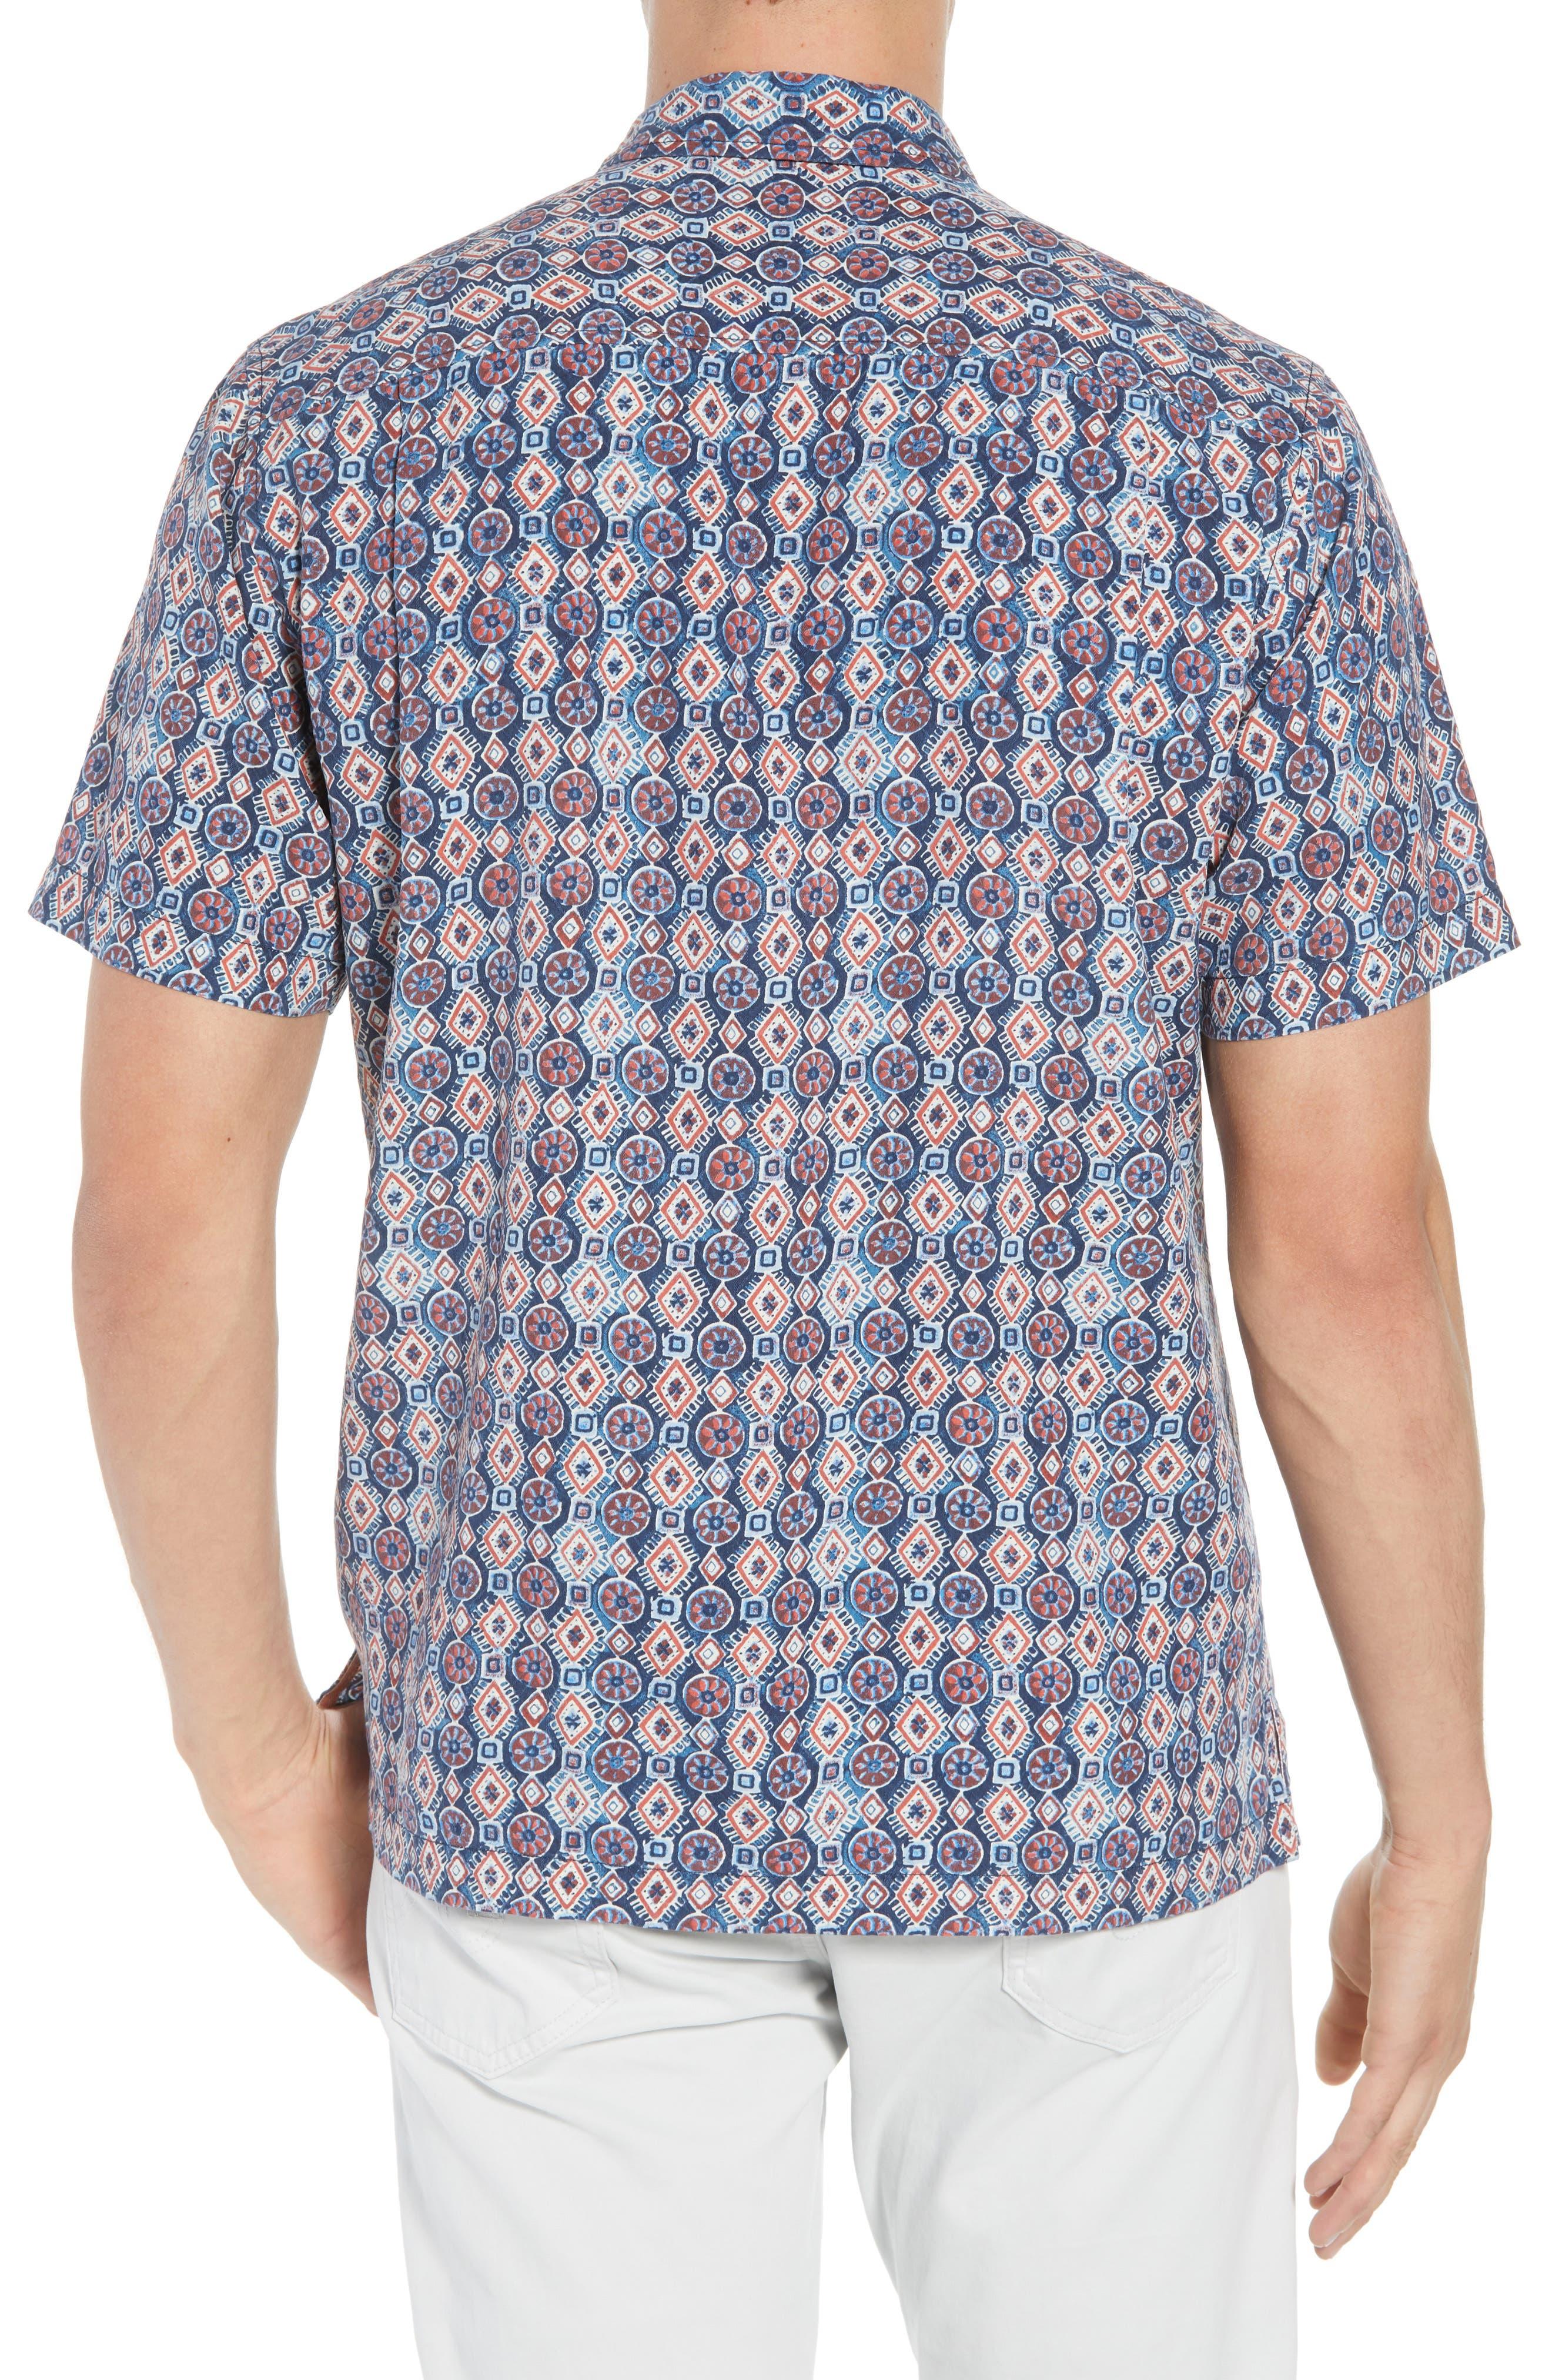 TOMMY BAHAMA,                             Tulum Tiles Silk Camp Shirt,                             Alternate thumbnail 2, color,                             400